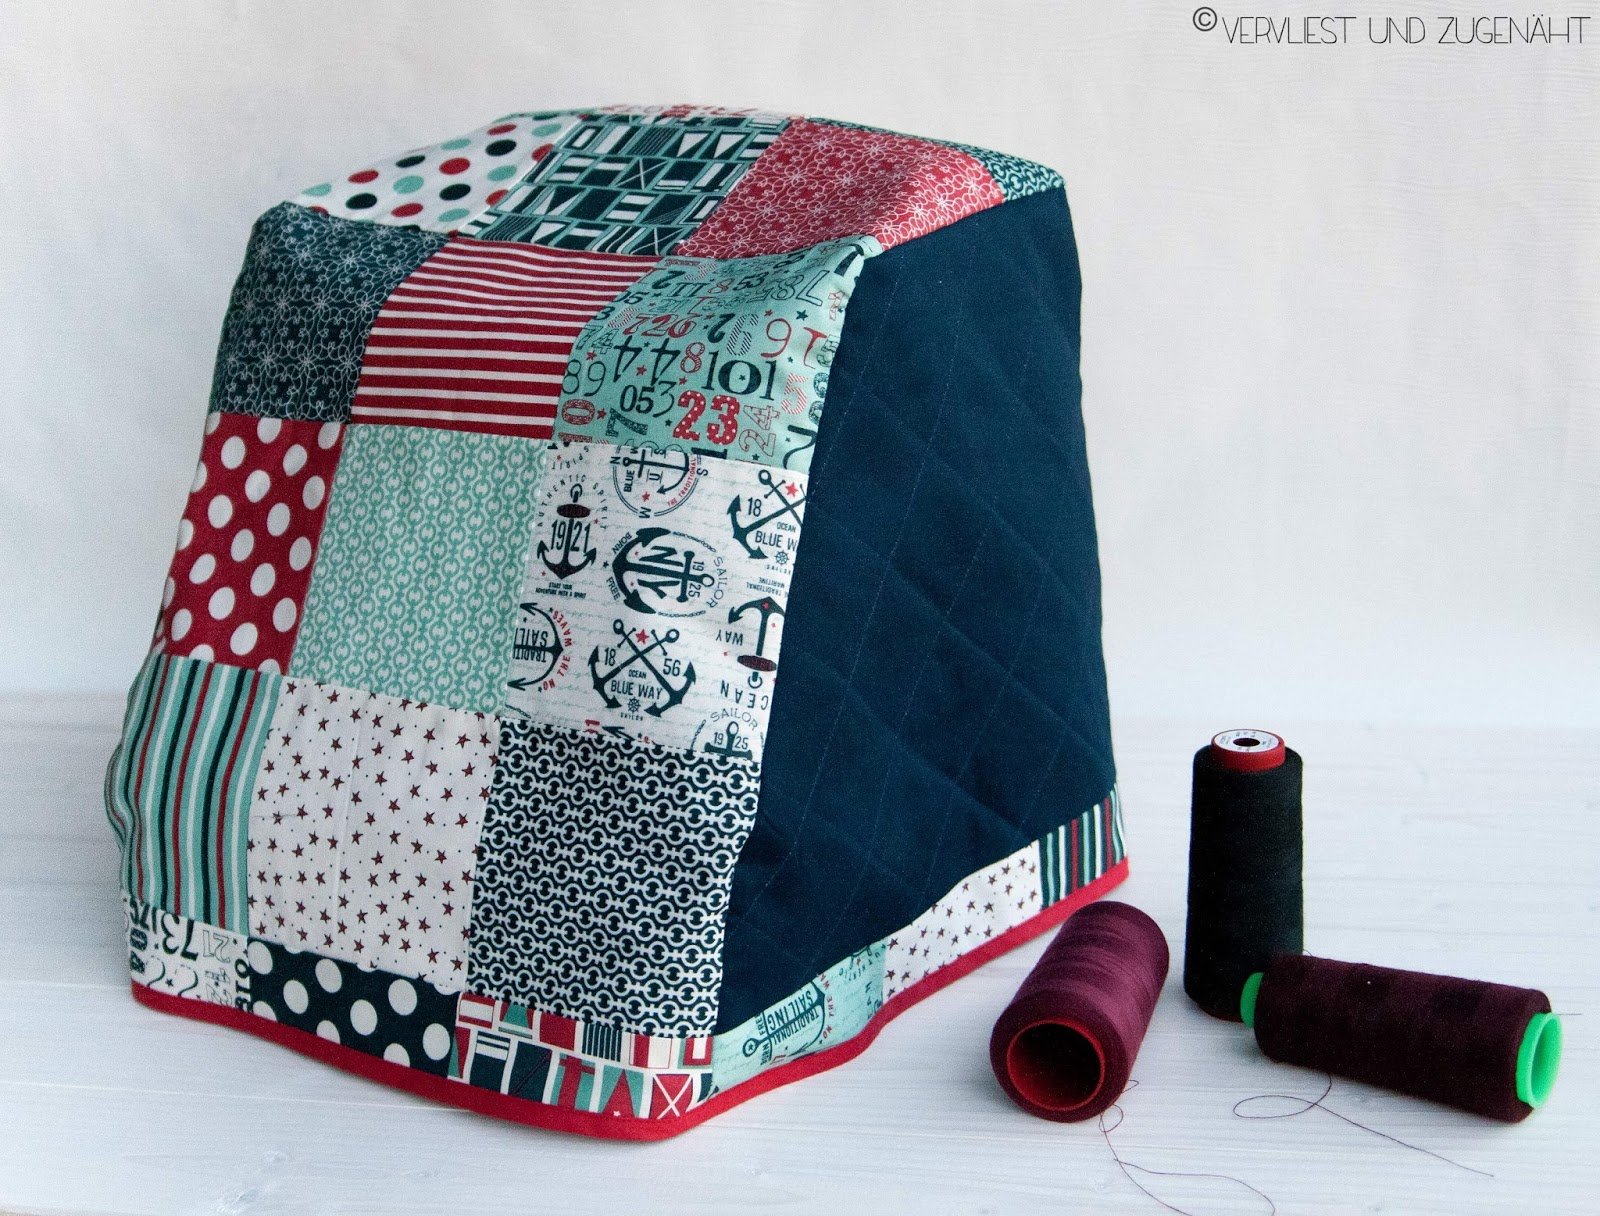 vervliest und zugen ht n hmaschinenh lle aus charm pack gratis schnittmuster f r bernina. Black Bedroom Furniture Sets. Home Design Ideas